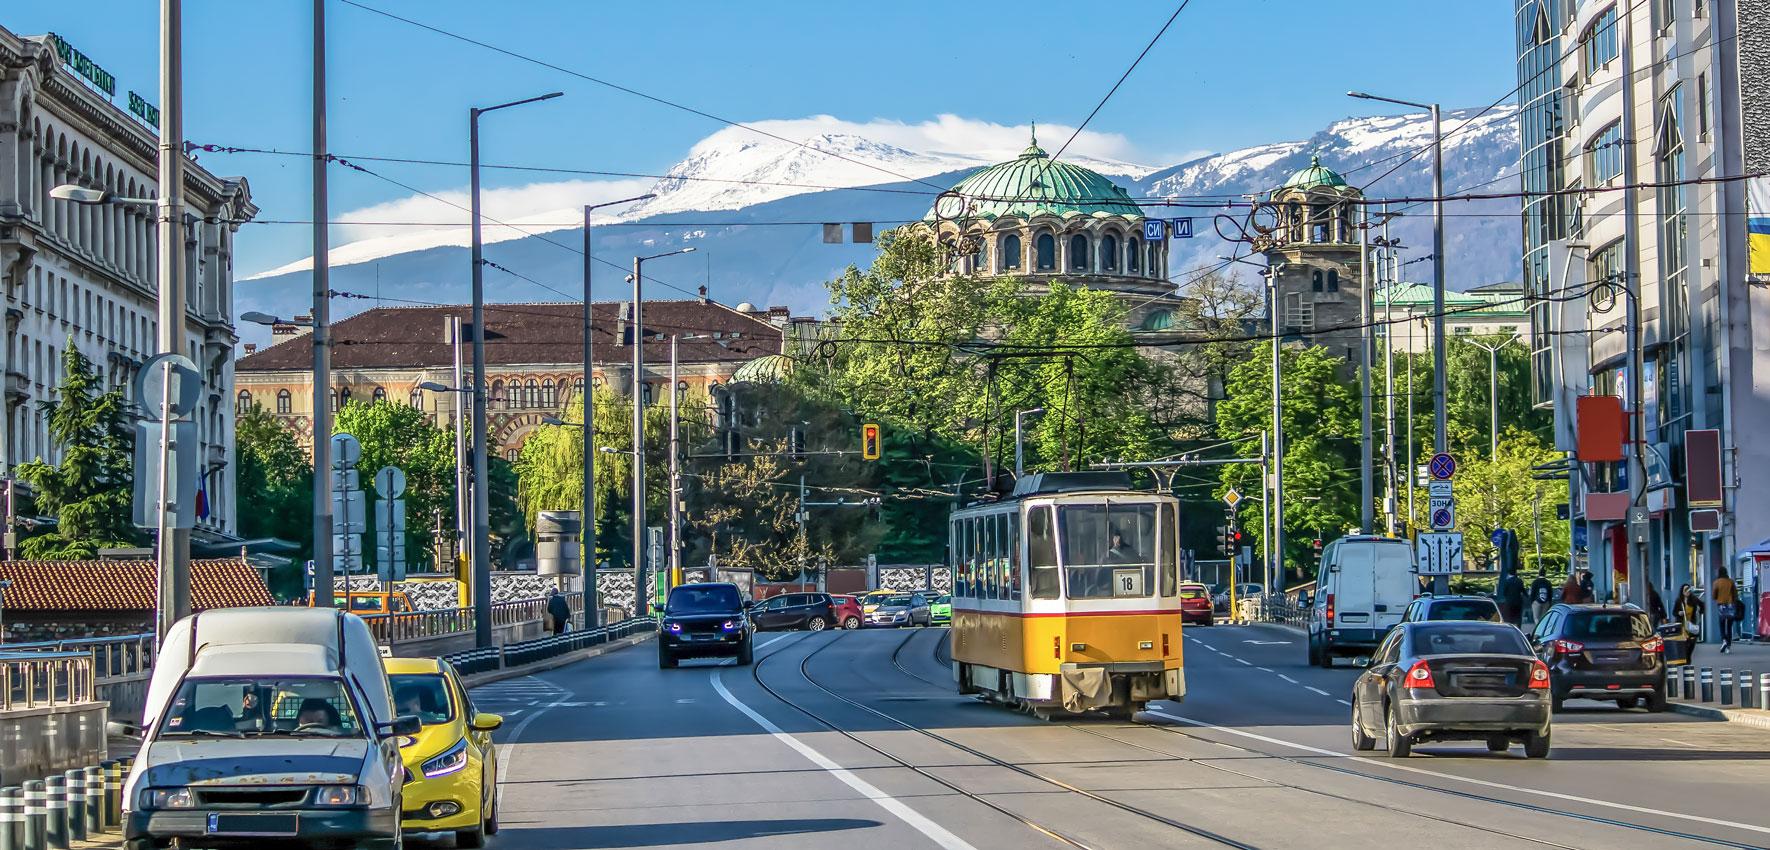 Sofia Bulgarien Tipps